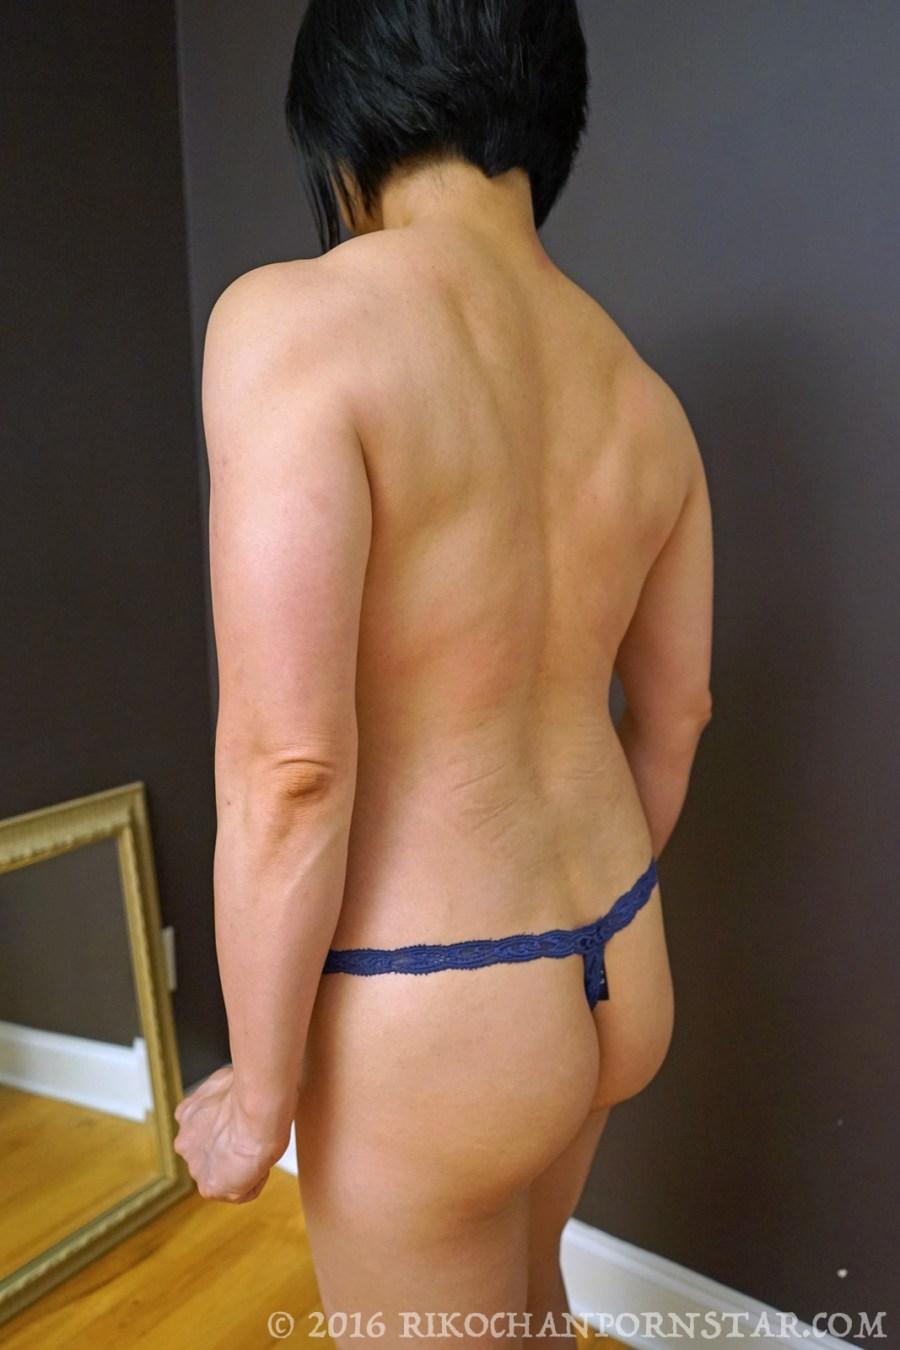 Rikochan topless bodybuilder back progress picture